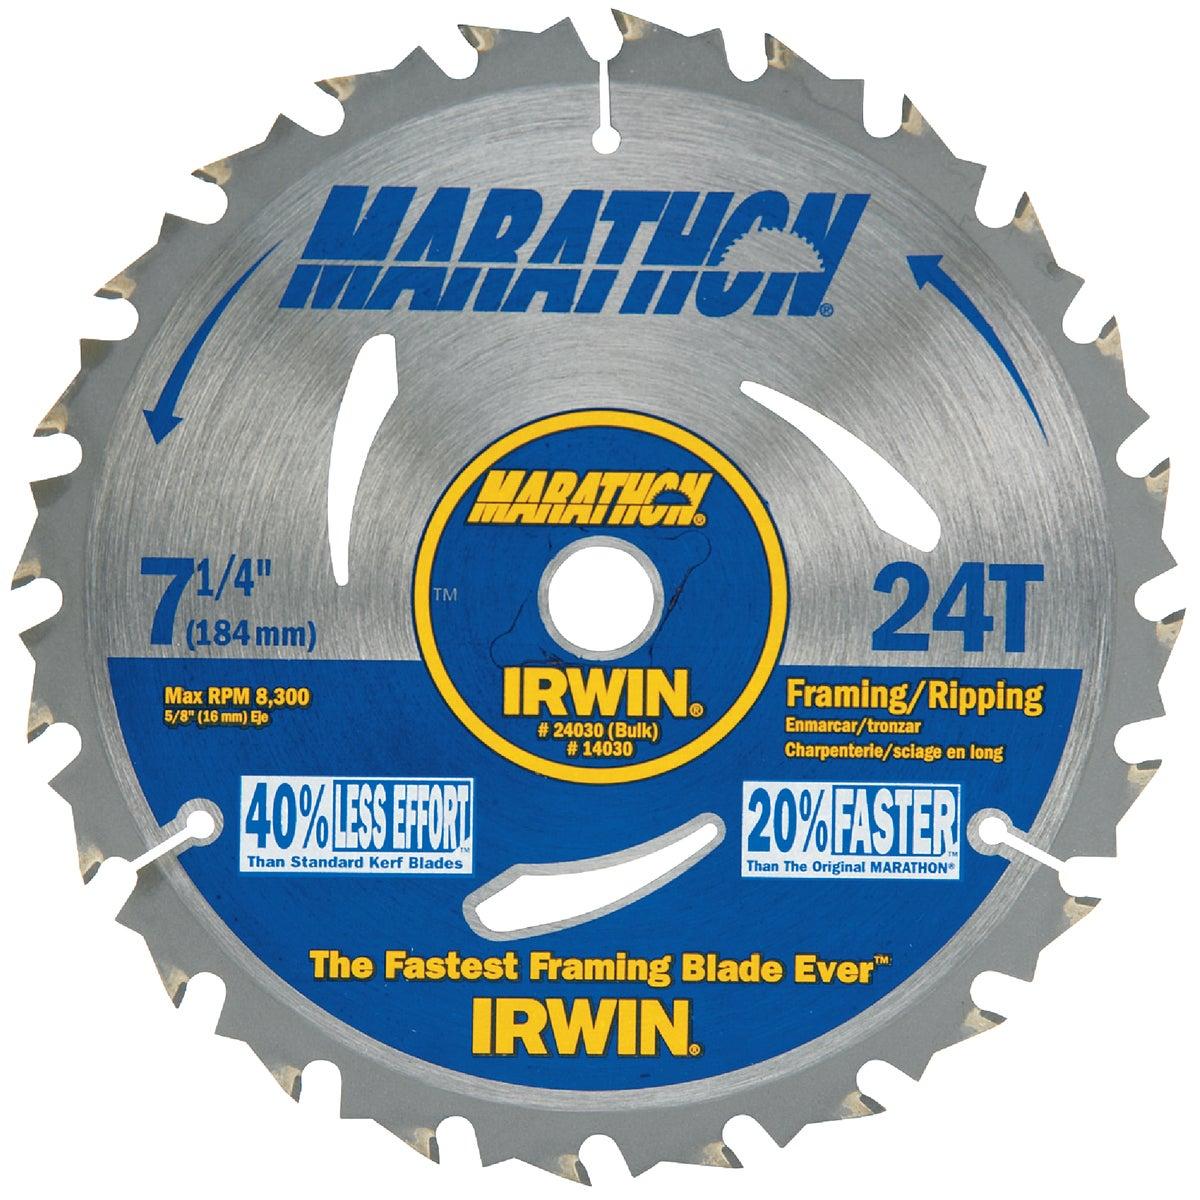 "7-1/4""24T MARATHON BLADE - 24030 by Irwin Industr Tool"